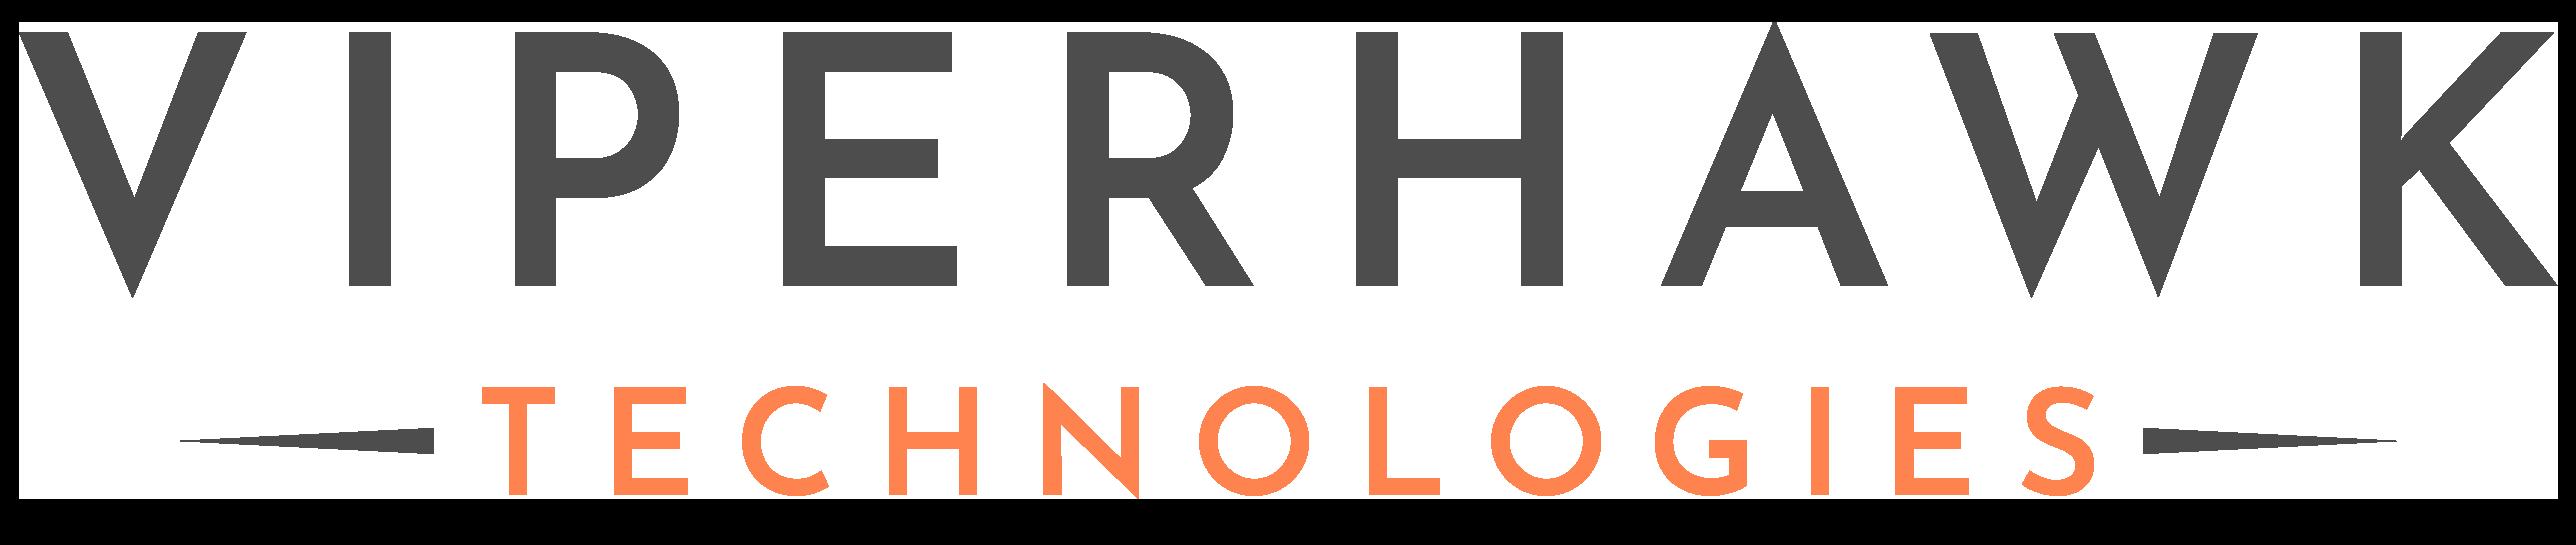 ViperHawk Technologies